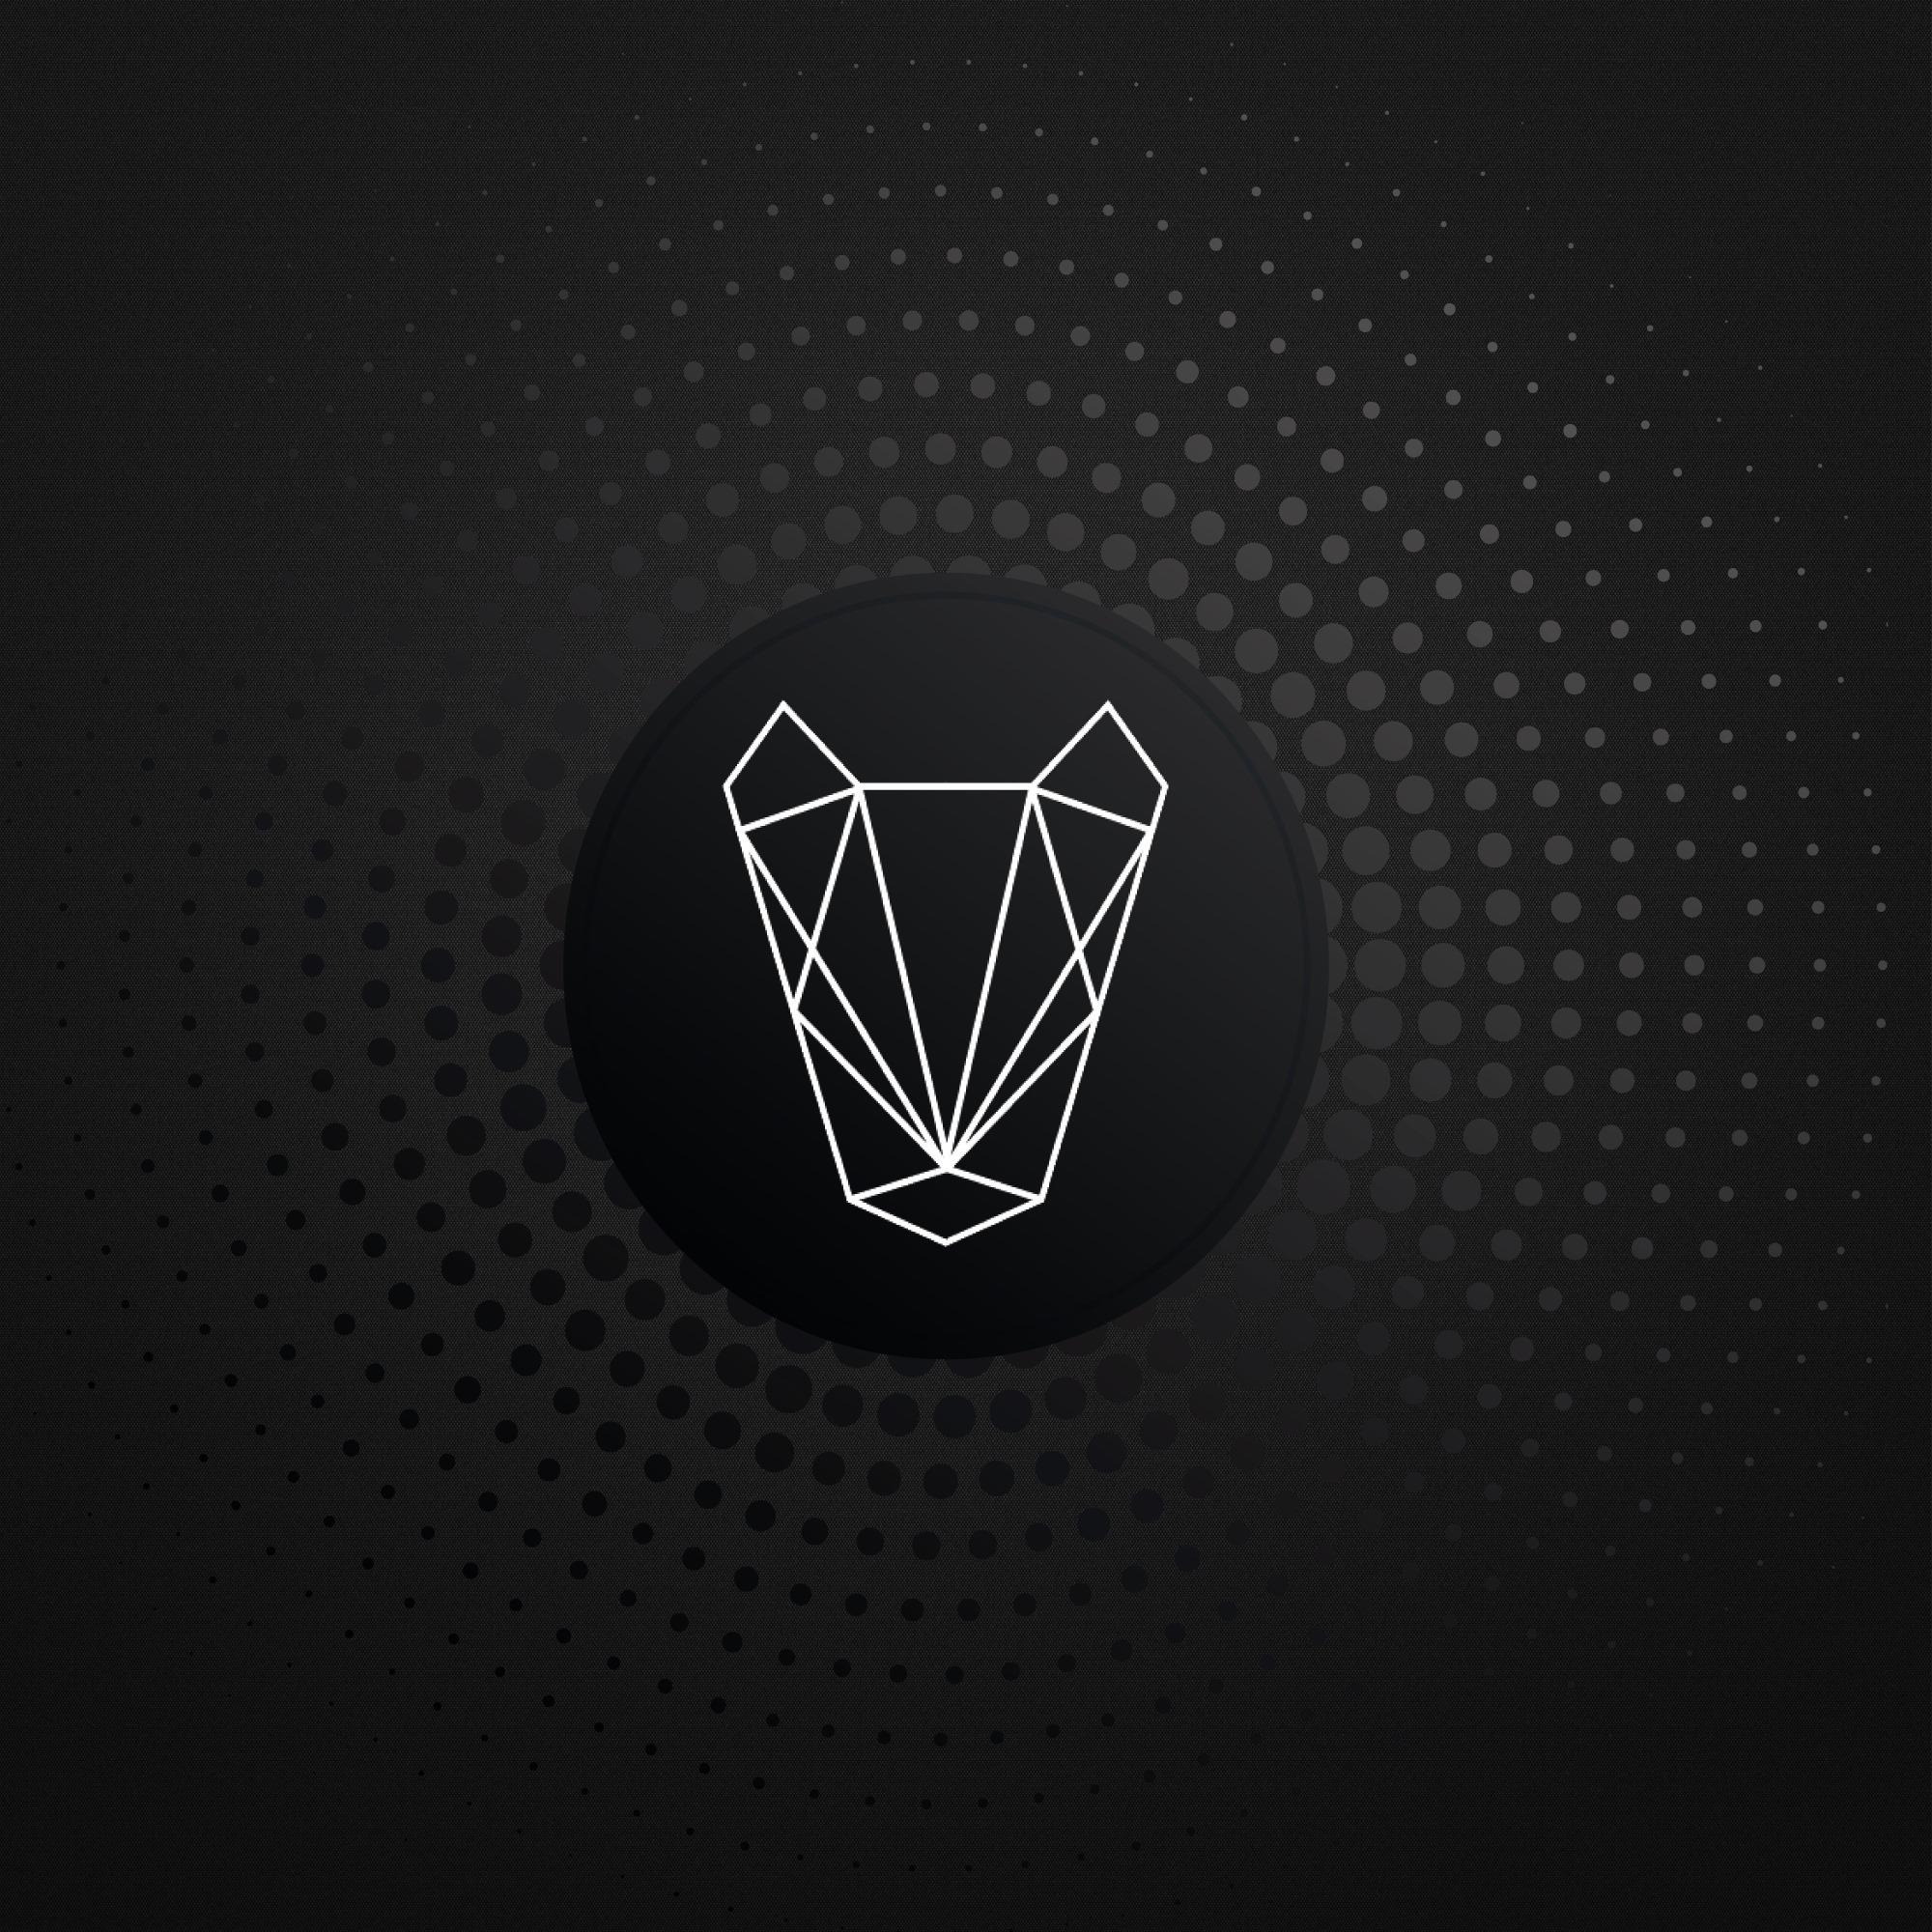 Black Hund Records